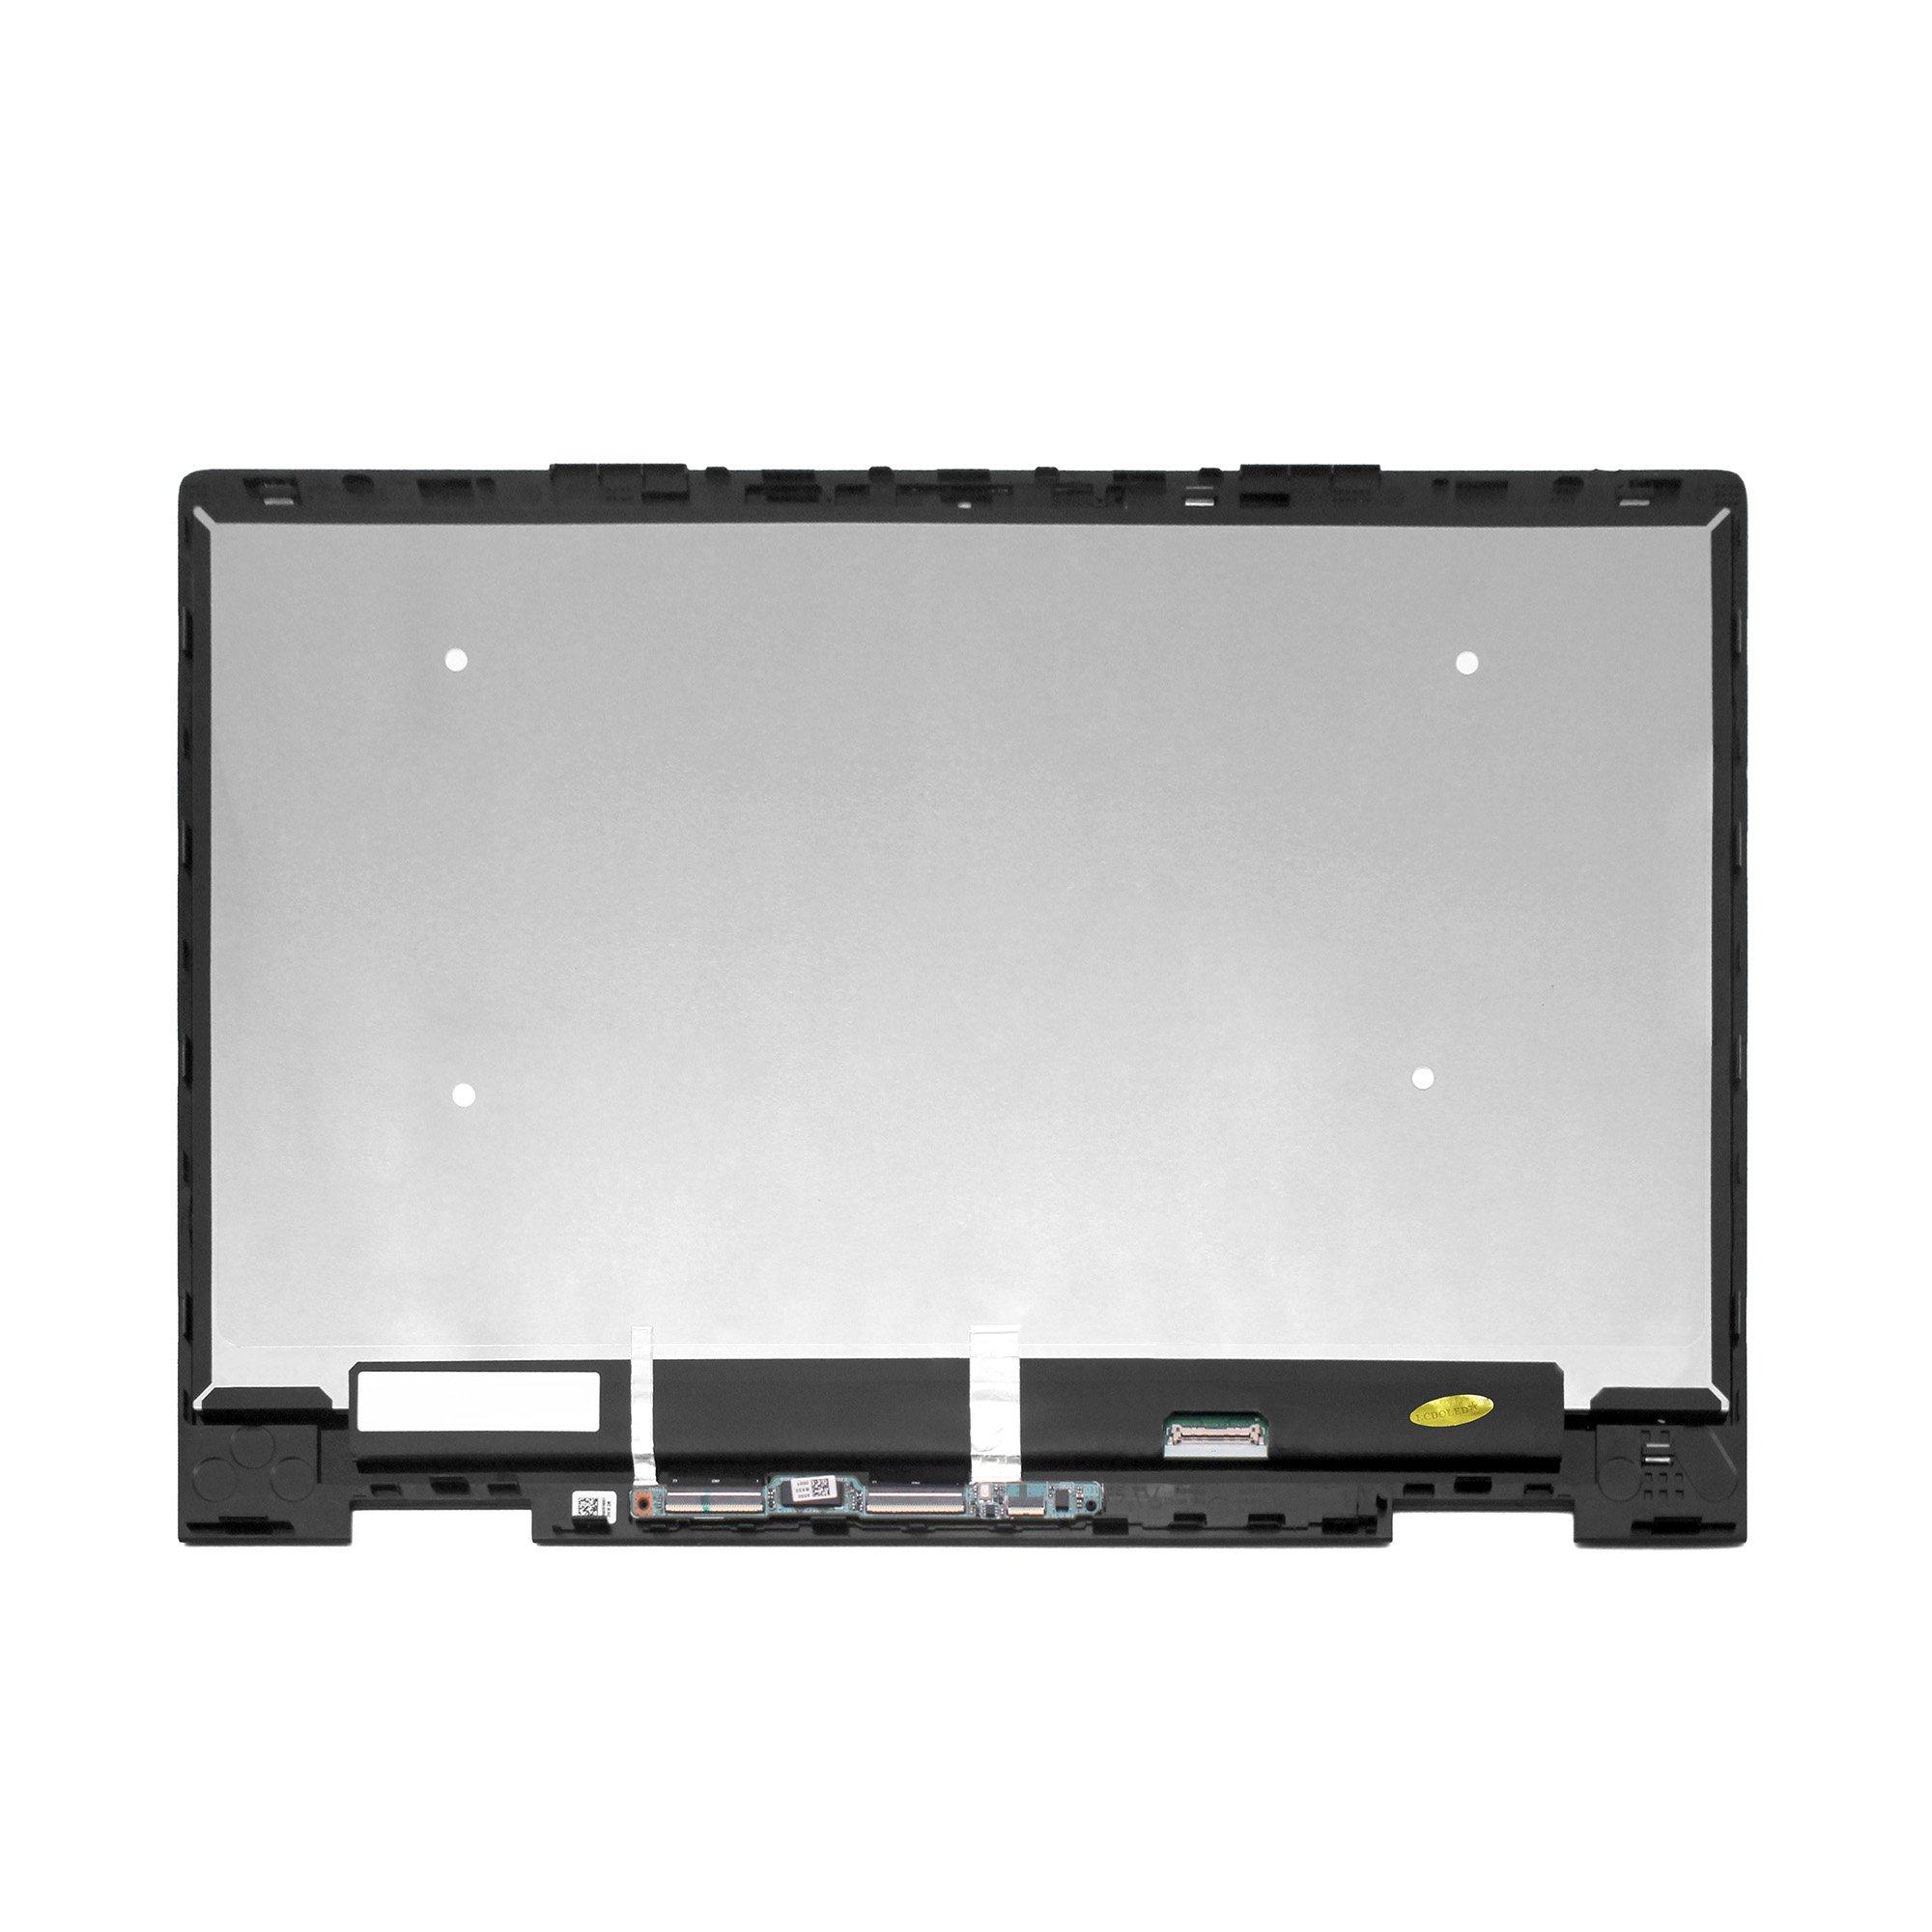 LCDOLED 15.6'' FullHD IPS LCD Touch Screen Digitizer Assembly + Bezel + Board for HP Envy x360 15-bq 15-bq000 15-bq100 15m-bq000 15m-bq100 15m-bq021dx 15m-bq121dx 15-bq175nr 15-bq075nr 15-bq051nr by LCDOLED (Image #2)